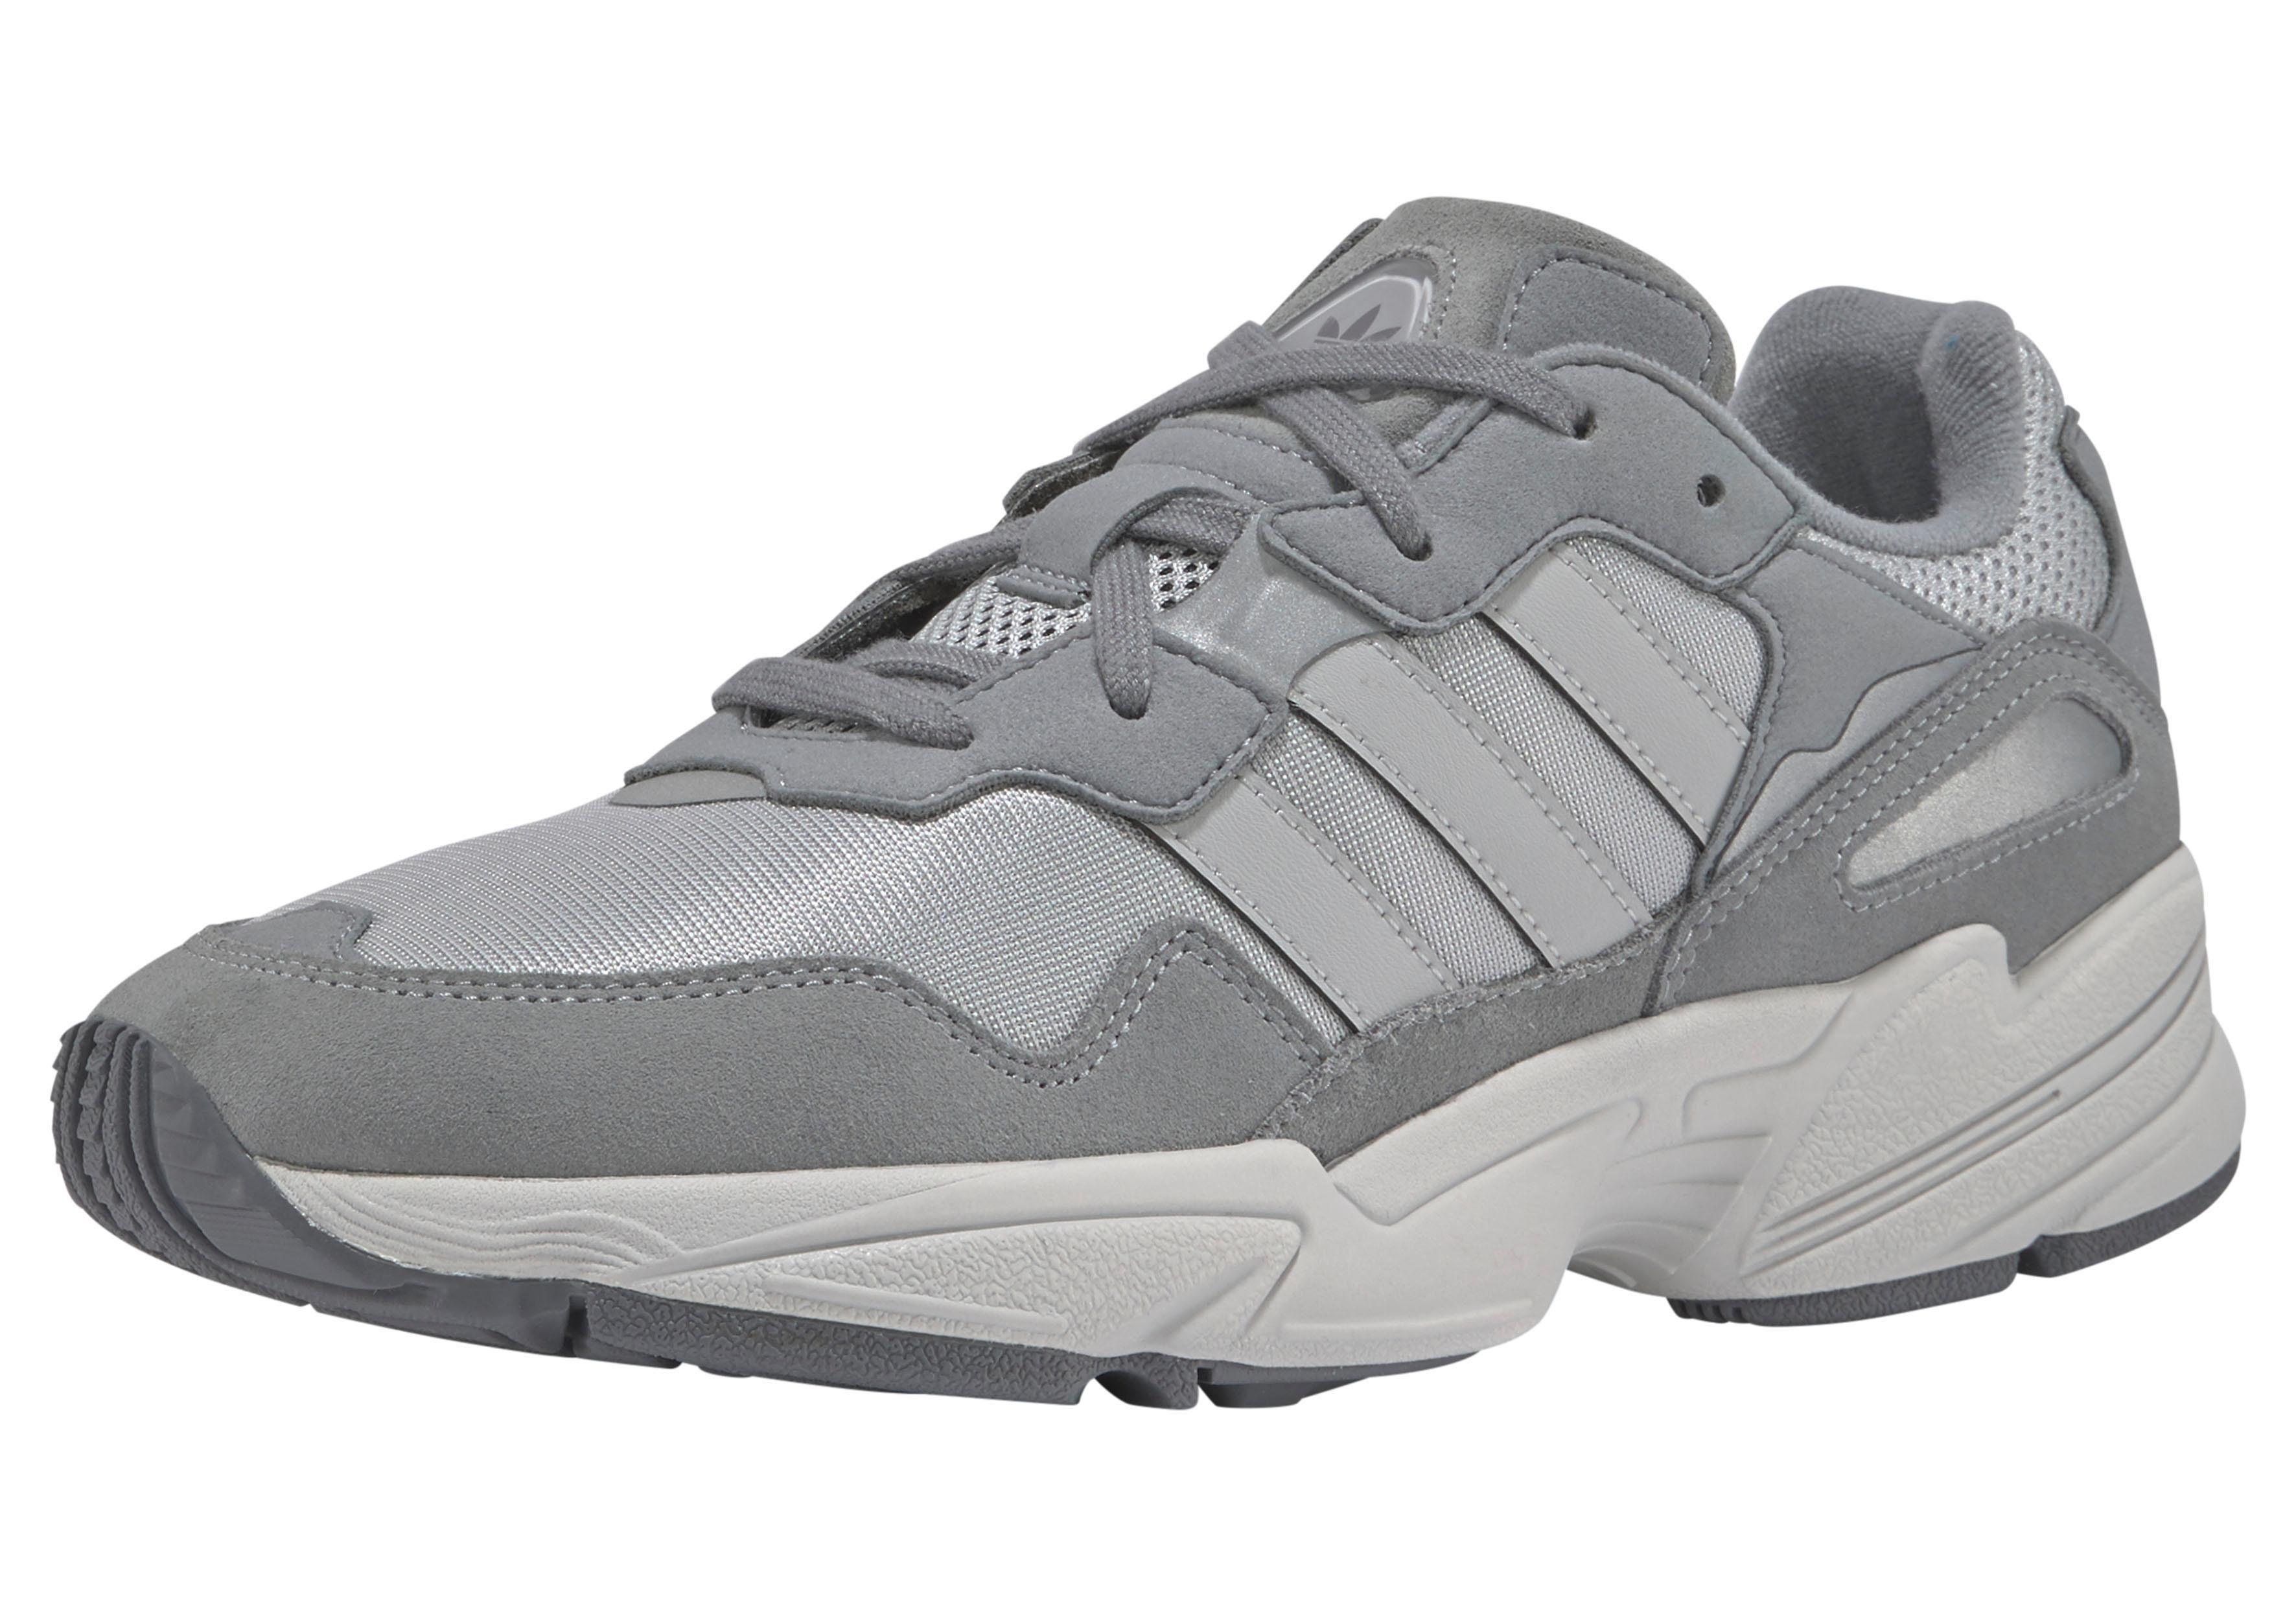 adidas schoenen 3000 price